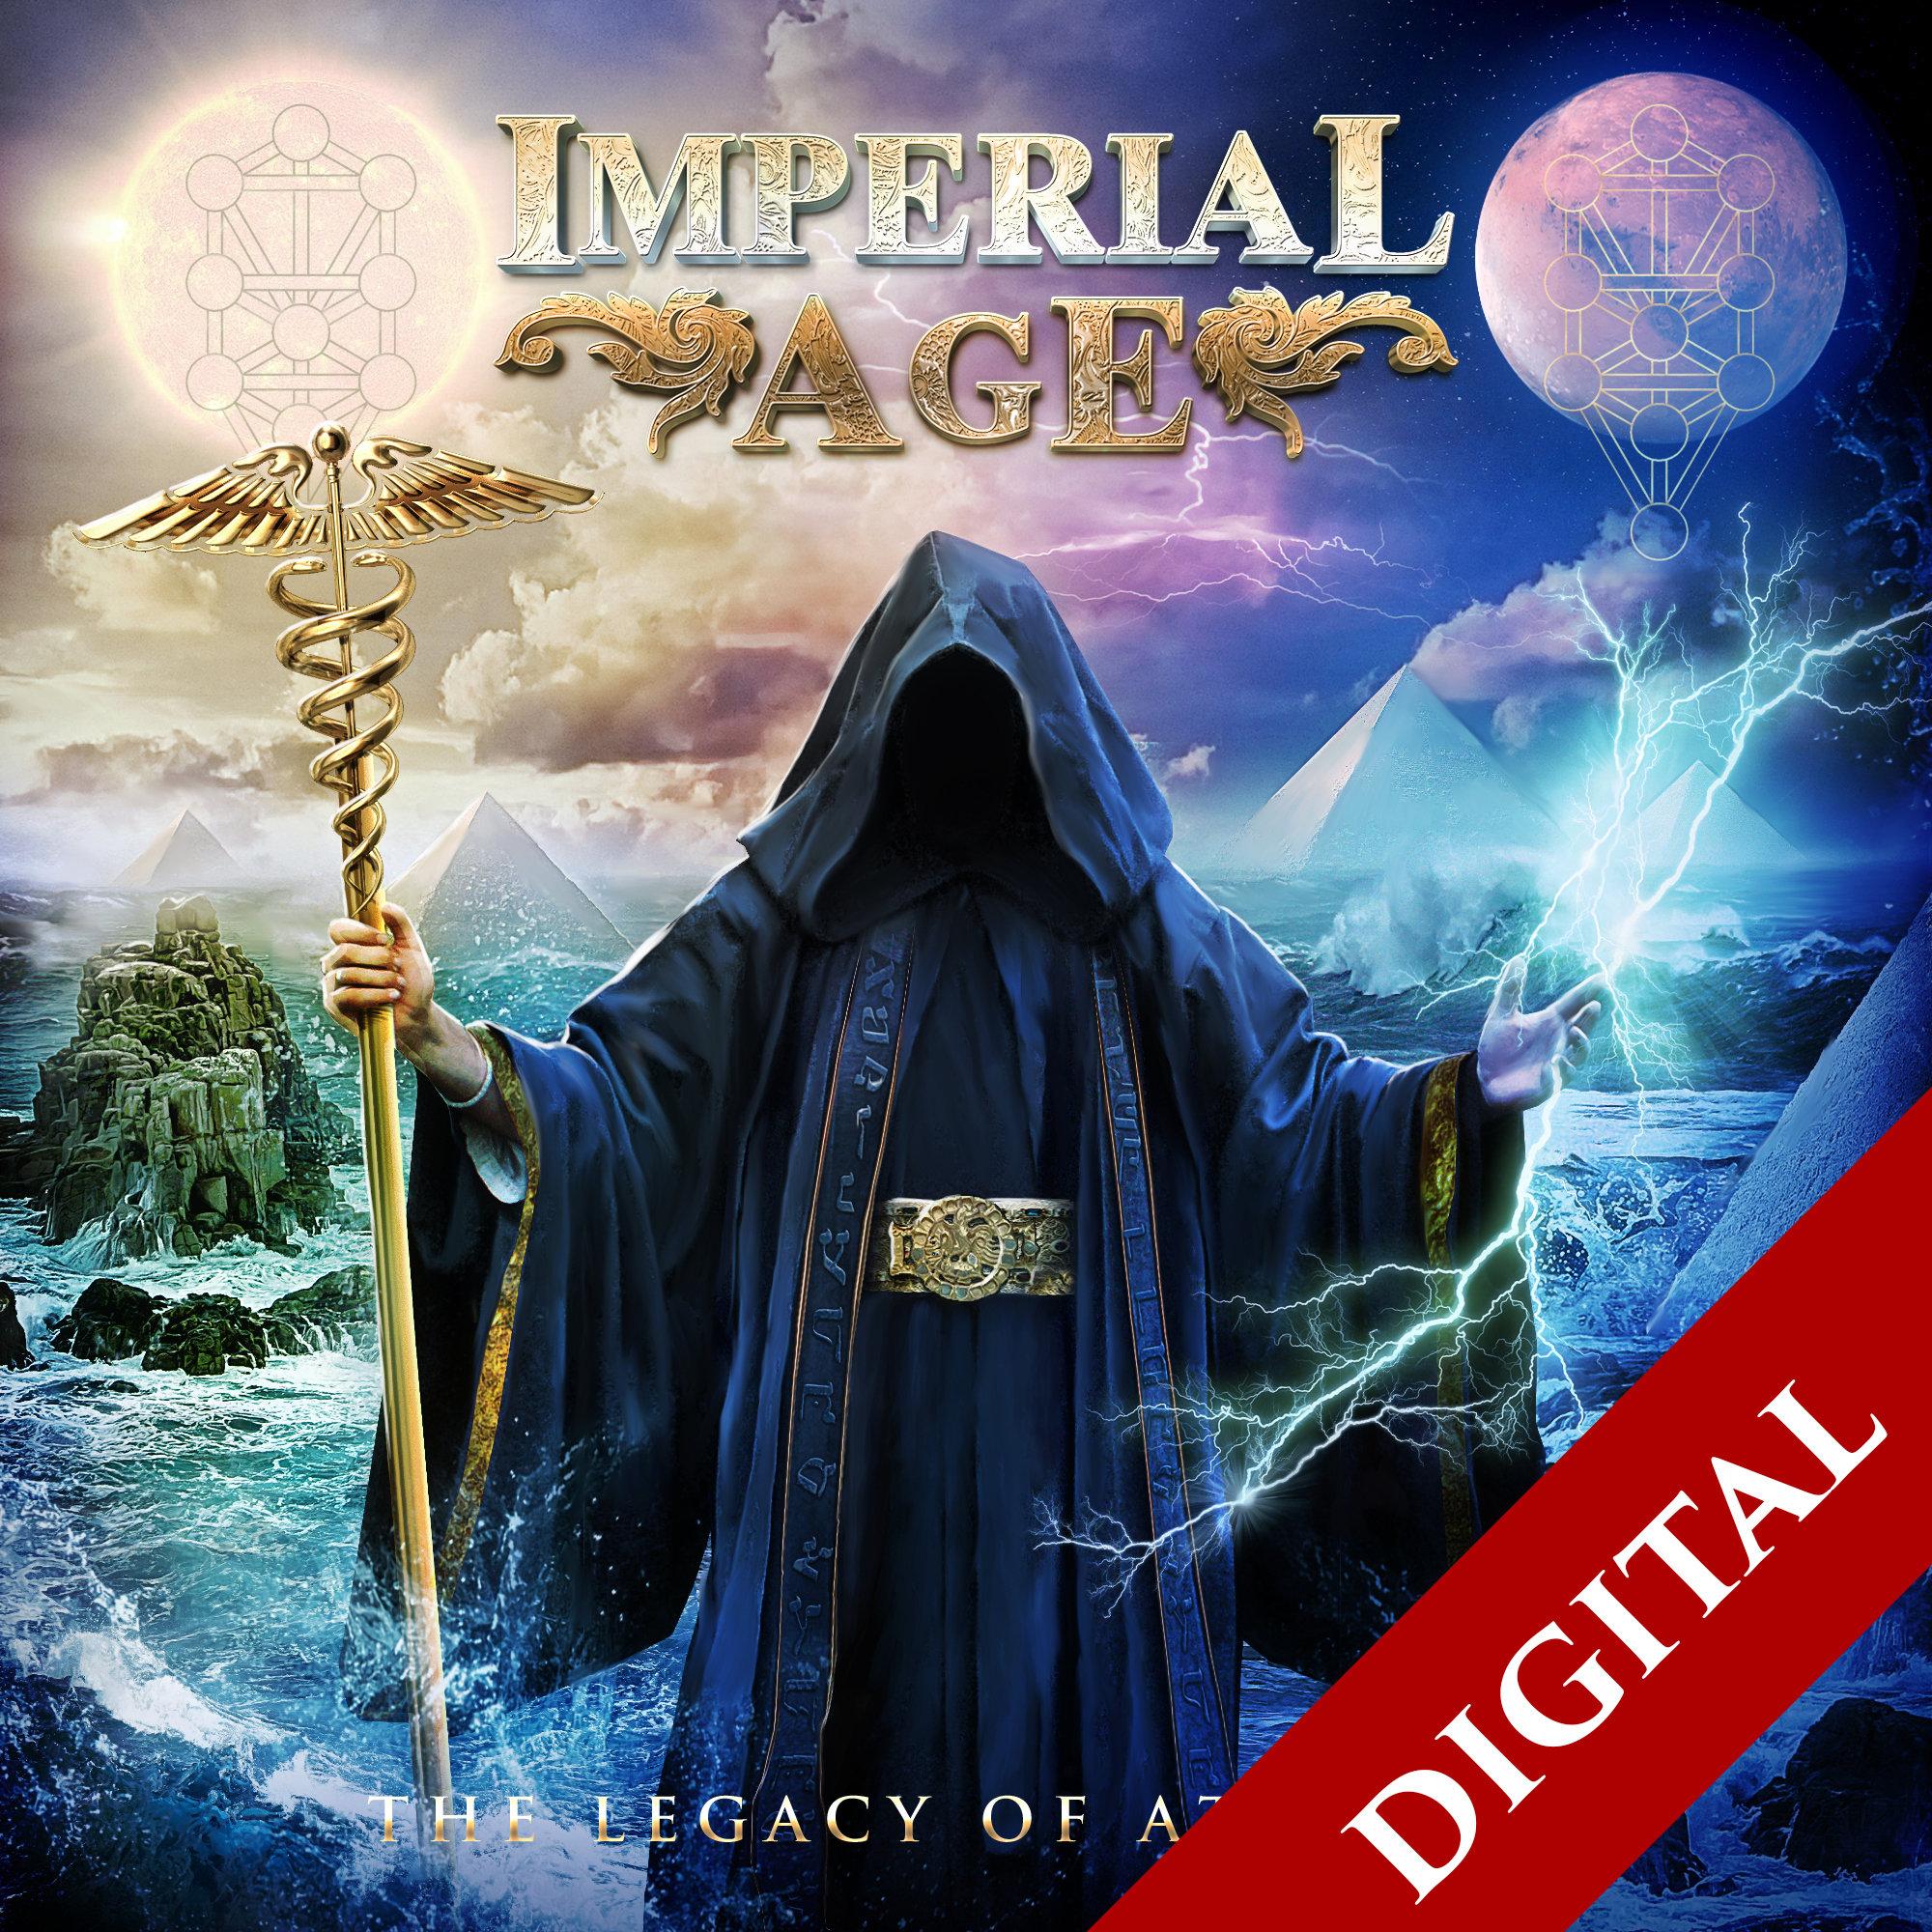 The Legacy of Atlantis [Digital Download] 00011